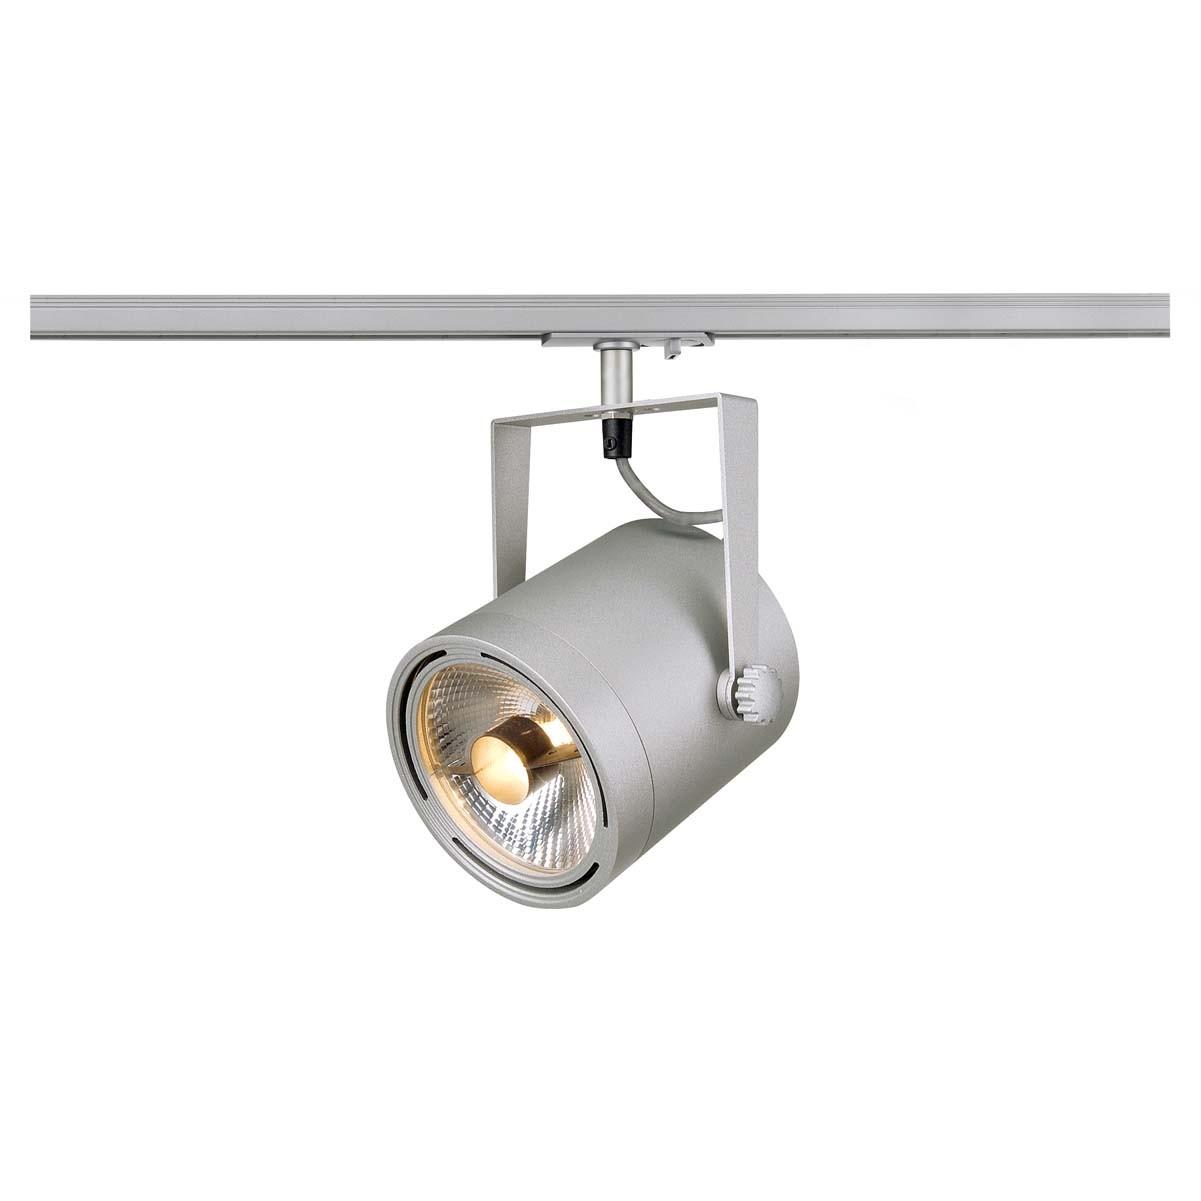 SLV 143804 Euro Spot 75W ES111 Silver Grey 1 Circuit 240V Track Light